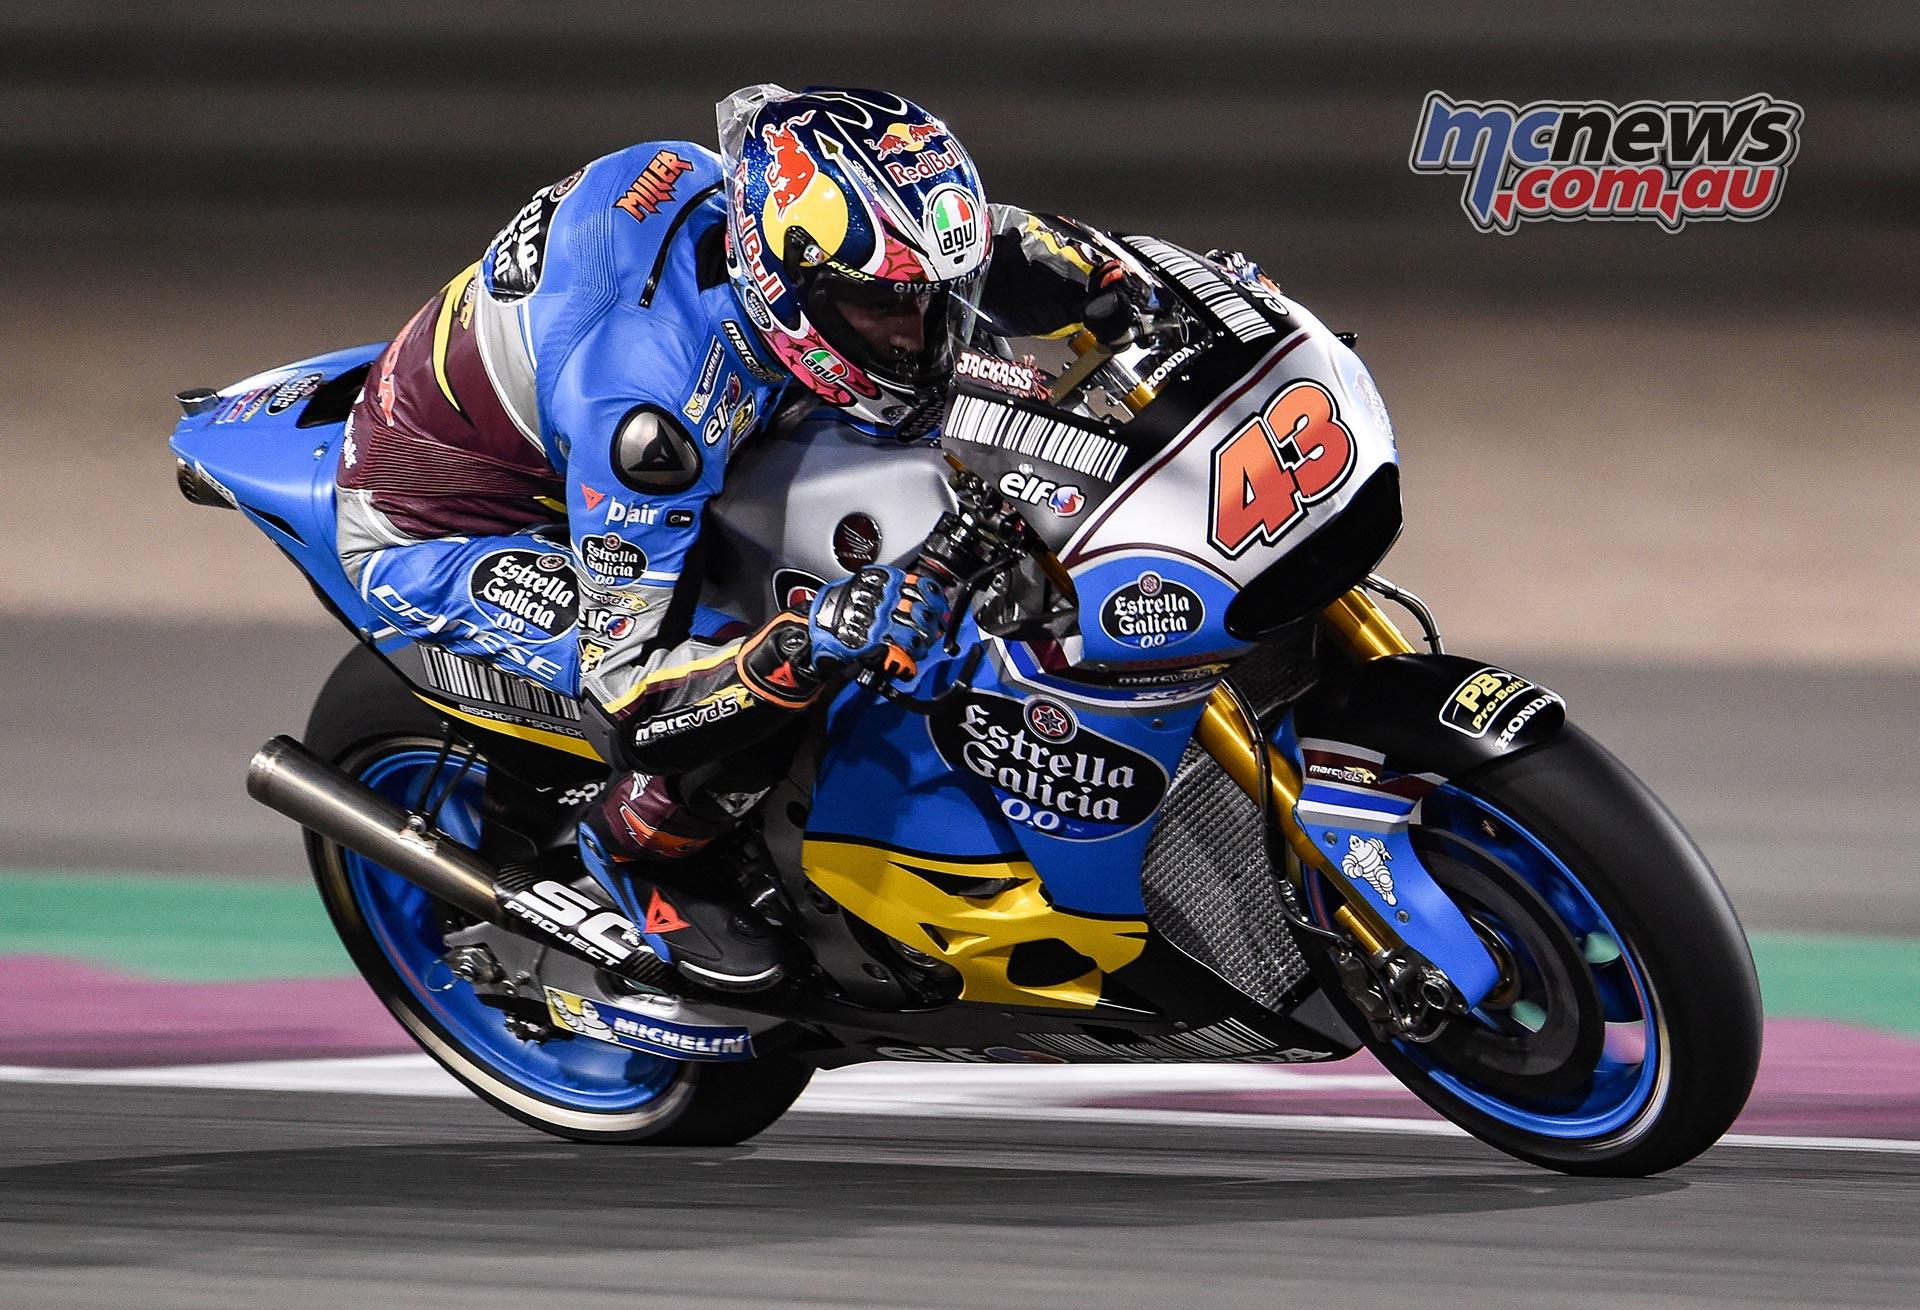 Jack Miller takes 8th in Qatar season opener | MCNews.com.au